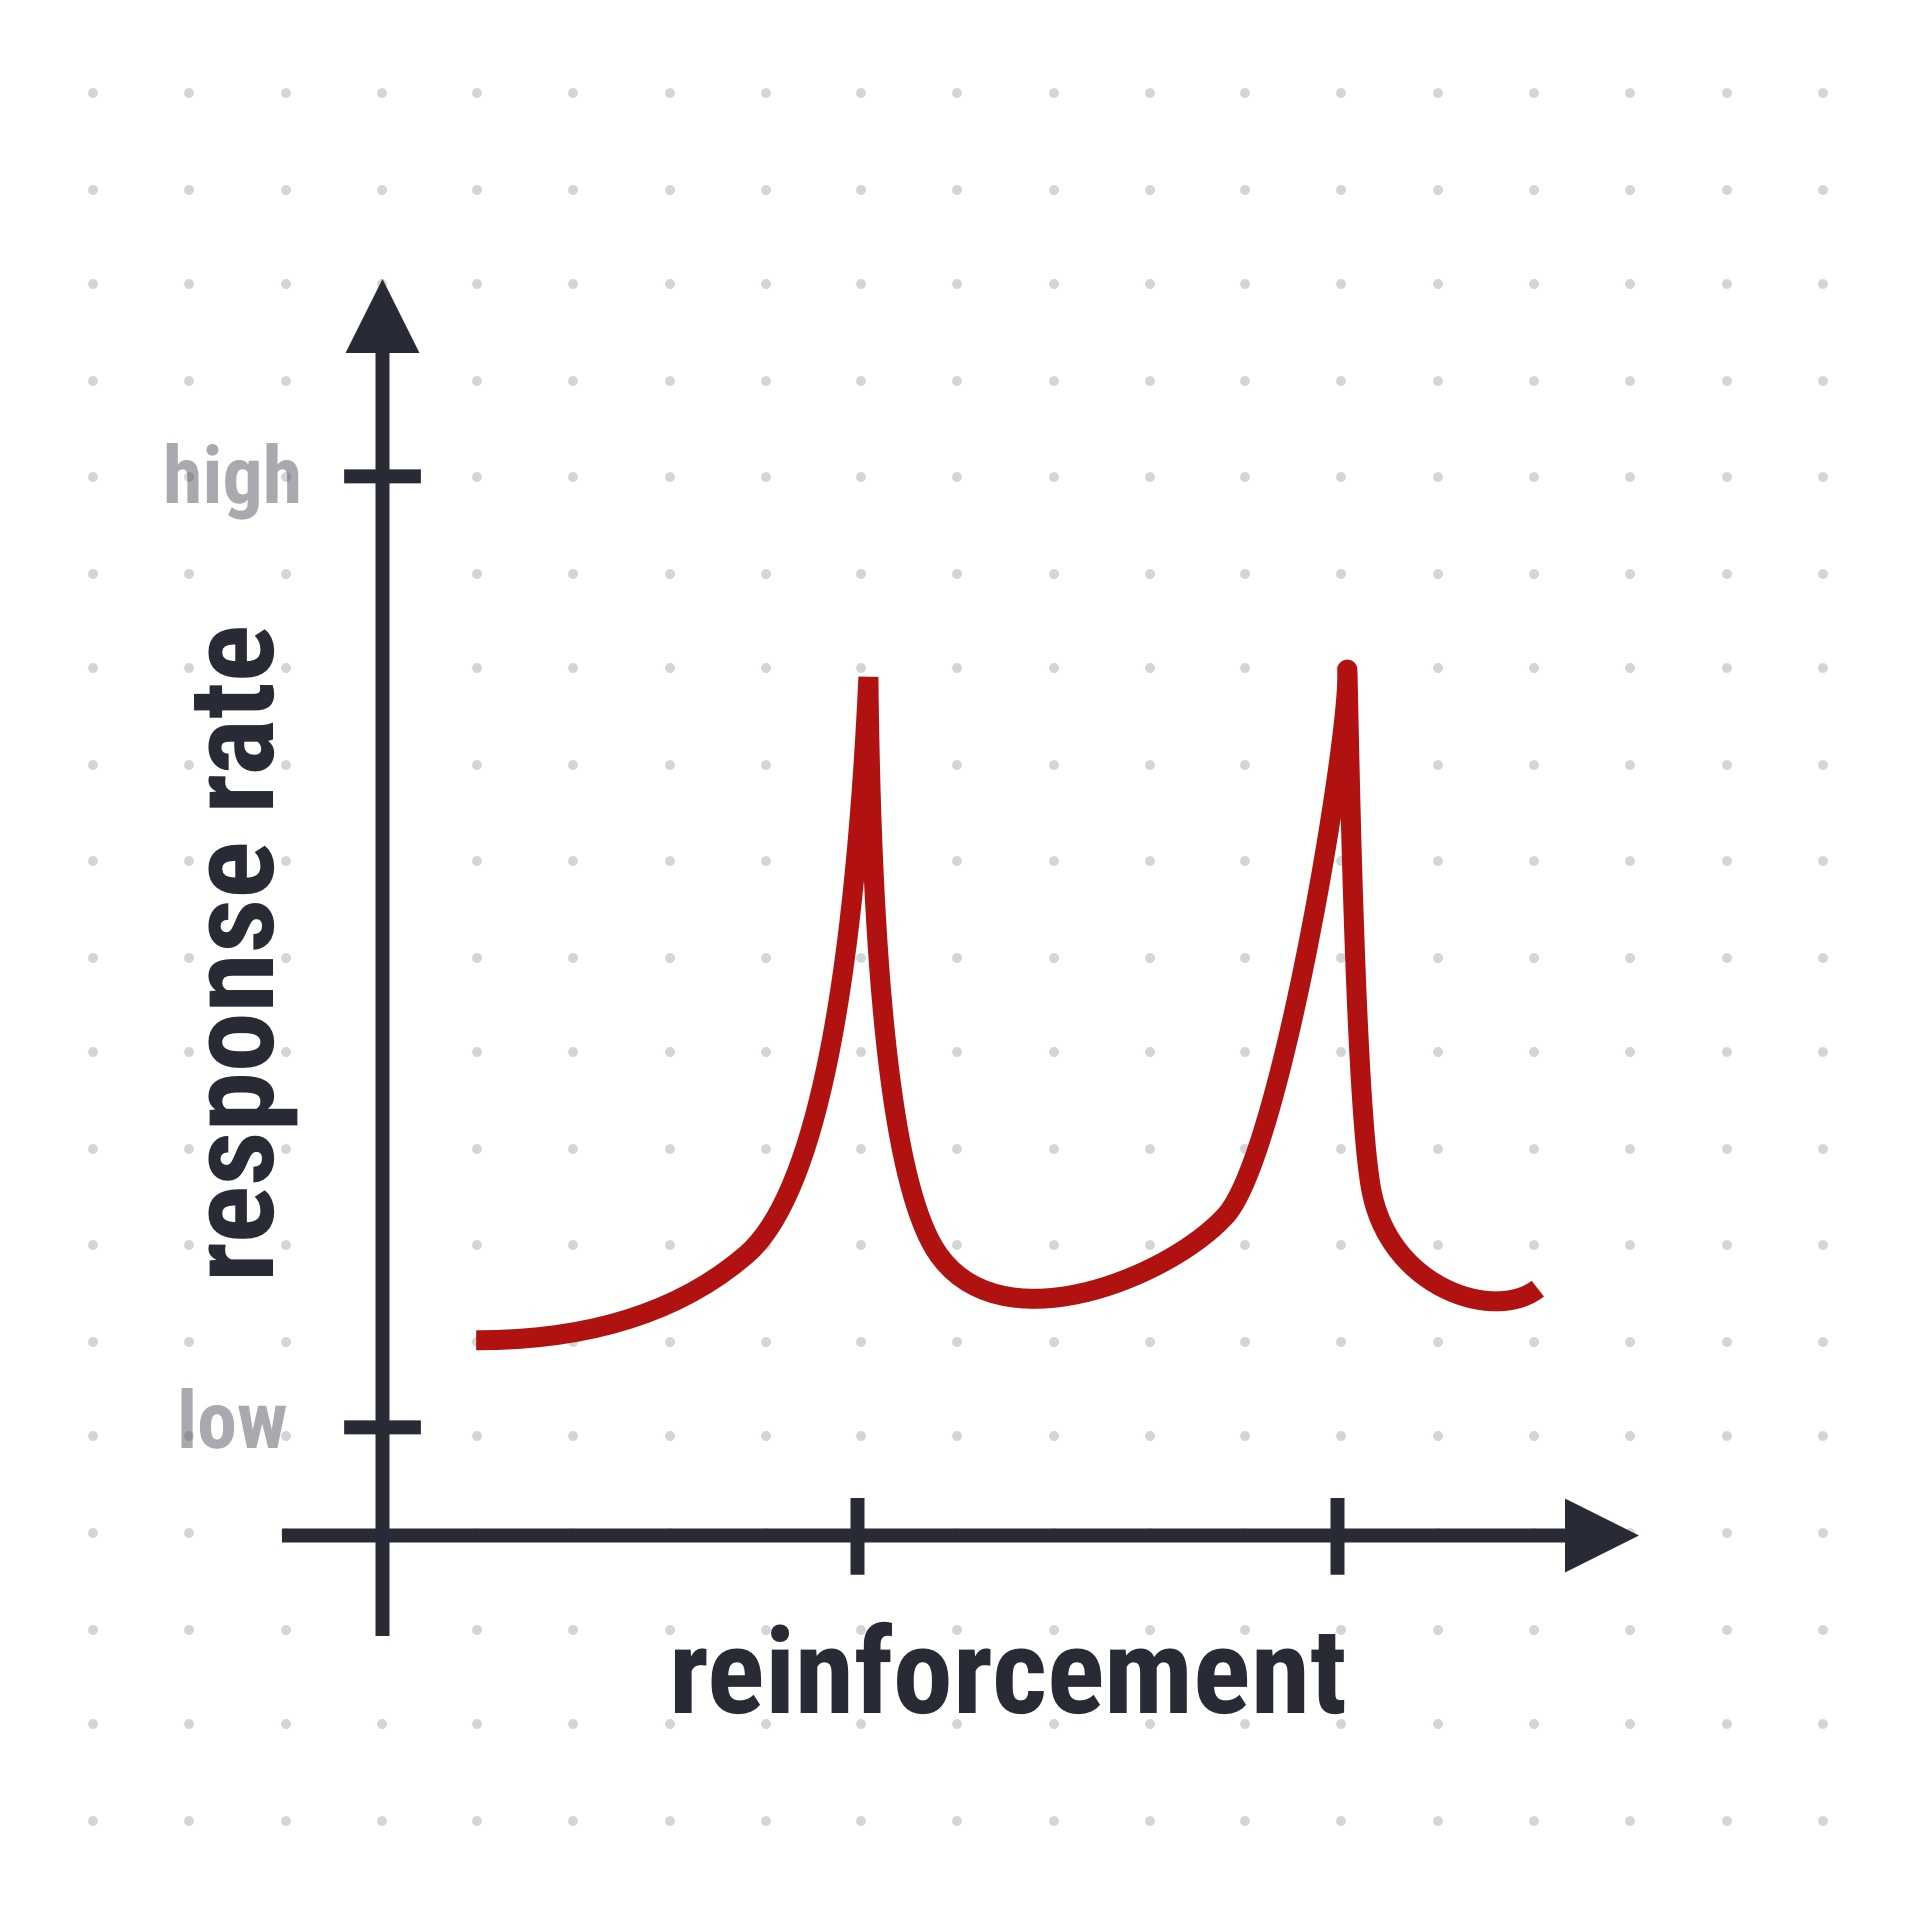 Schedule of Reinforcement (Behavioral psychology)